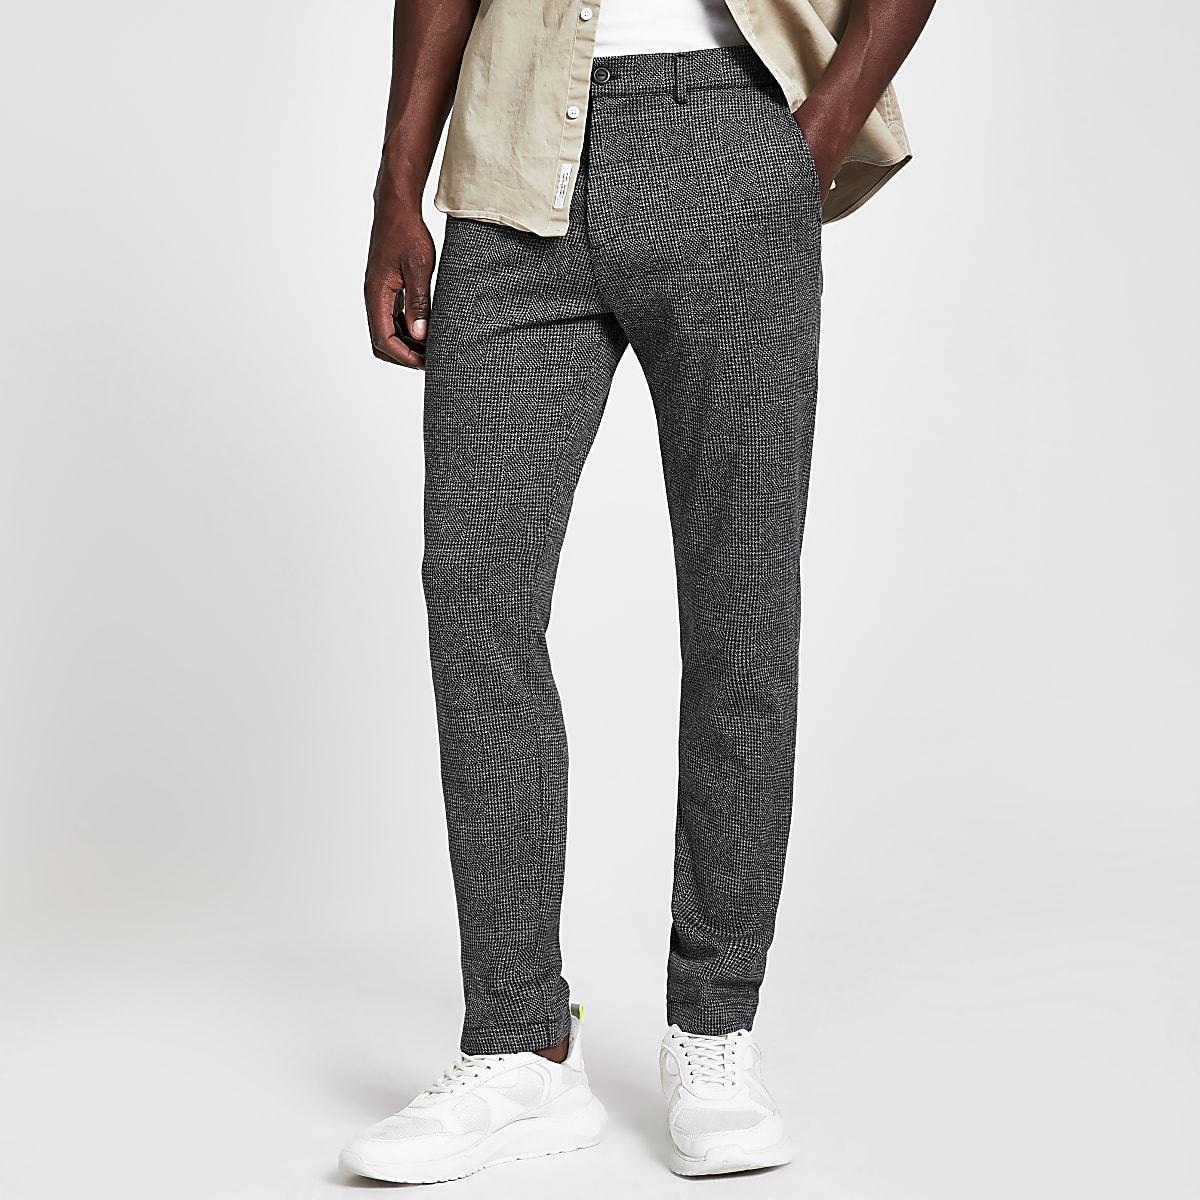 Pantalon super skinny stretch à carreaux gris